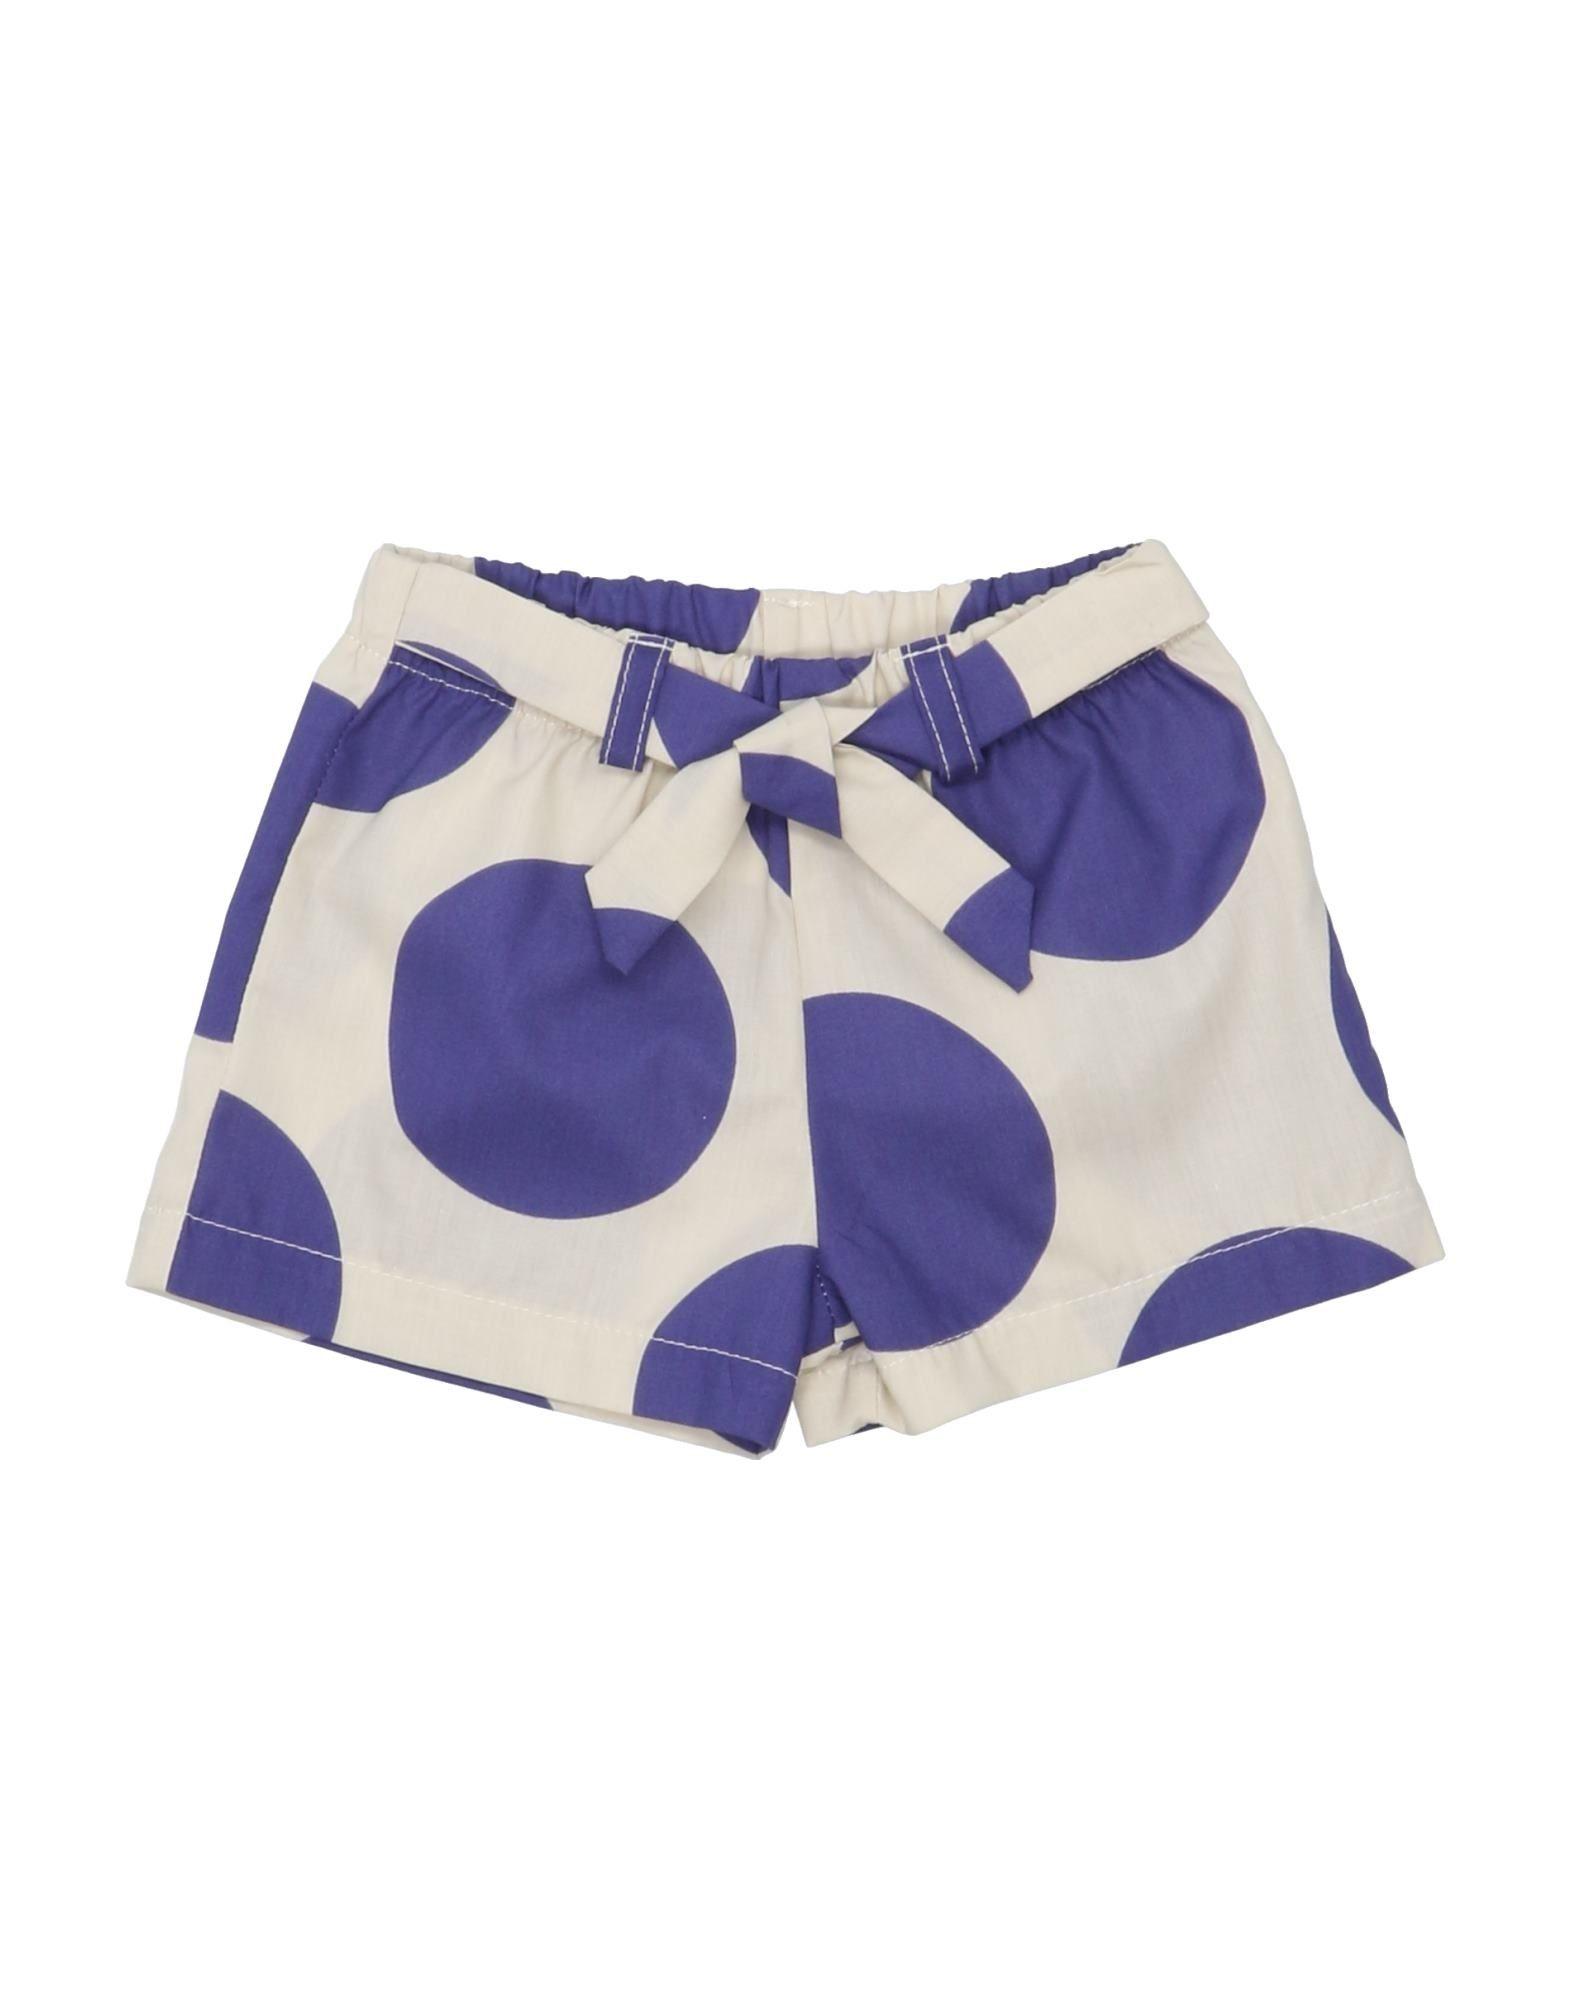 J.o. Milano Kids' Shorts In Blue